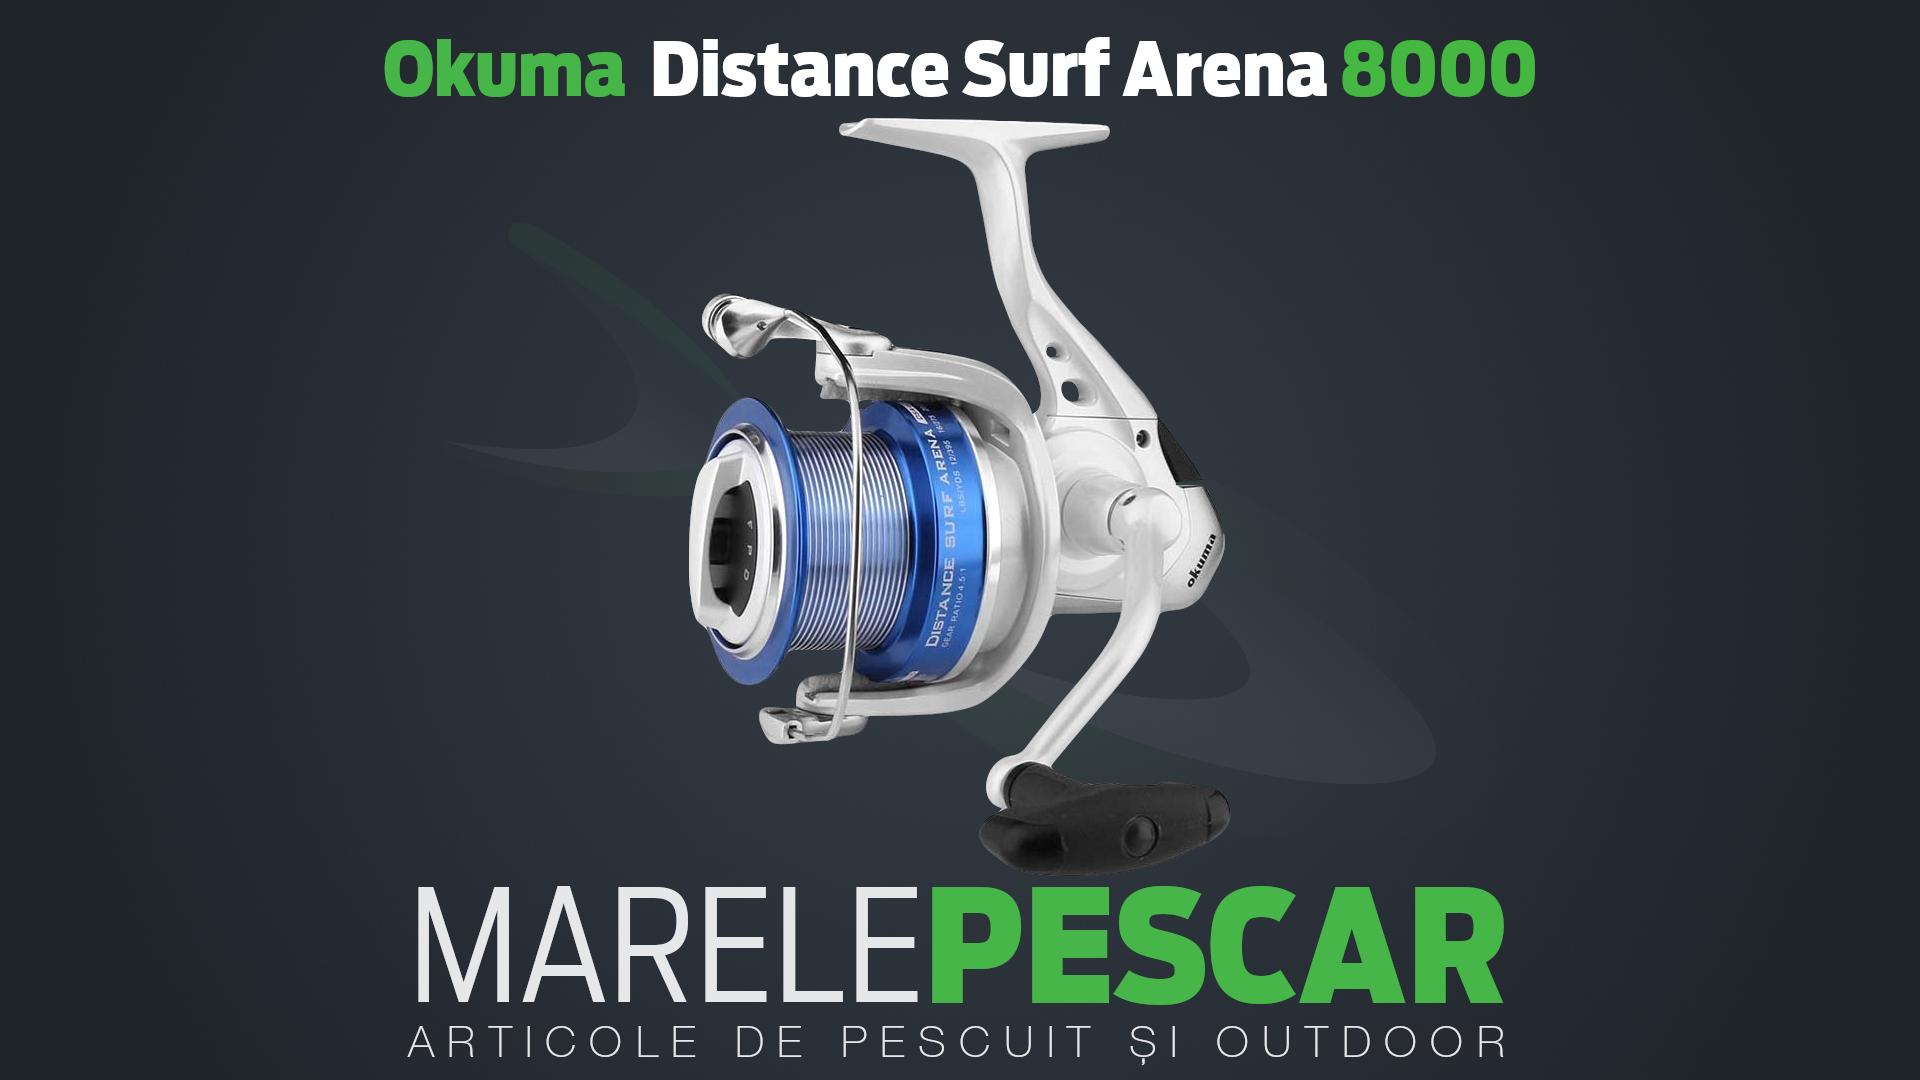 Okuma Distance Surf Arena 8000